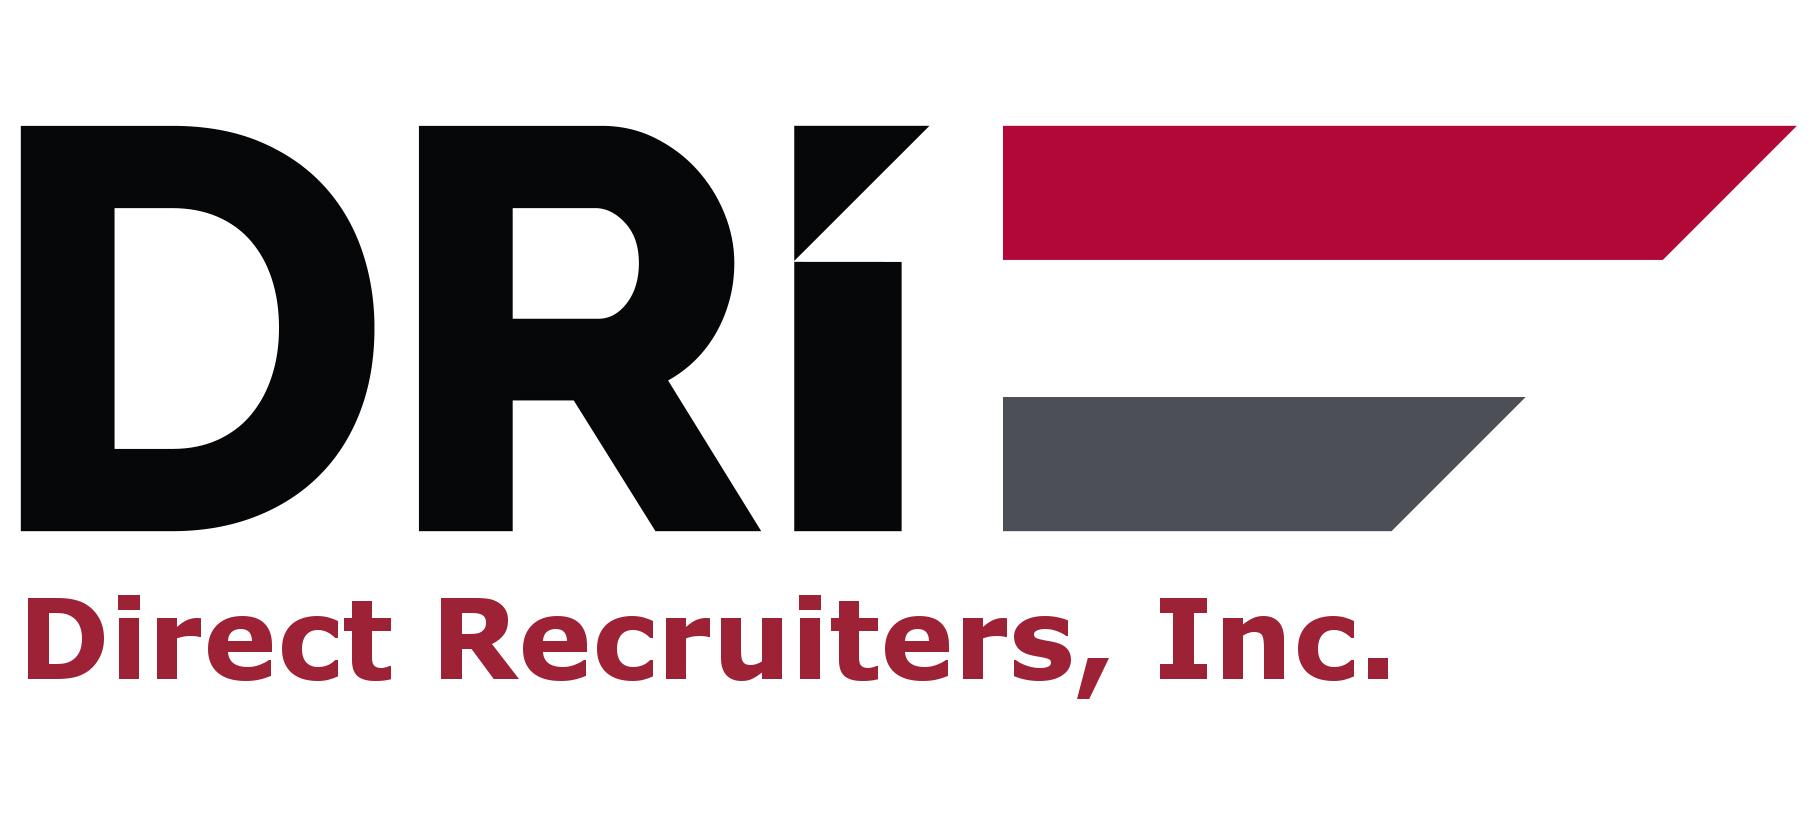 Direct Recruiters, Inc. logo